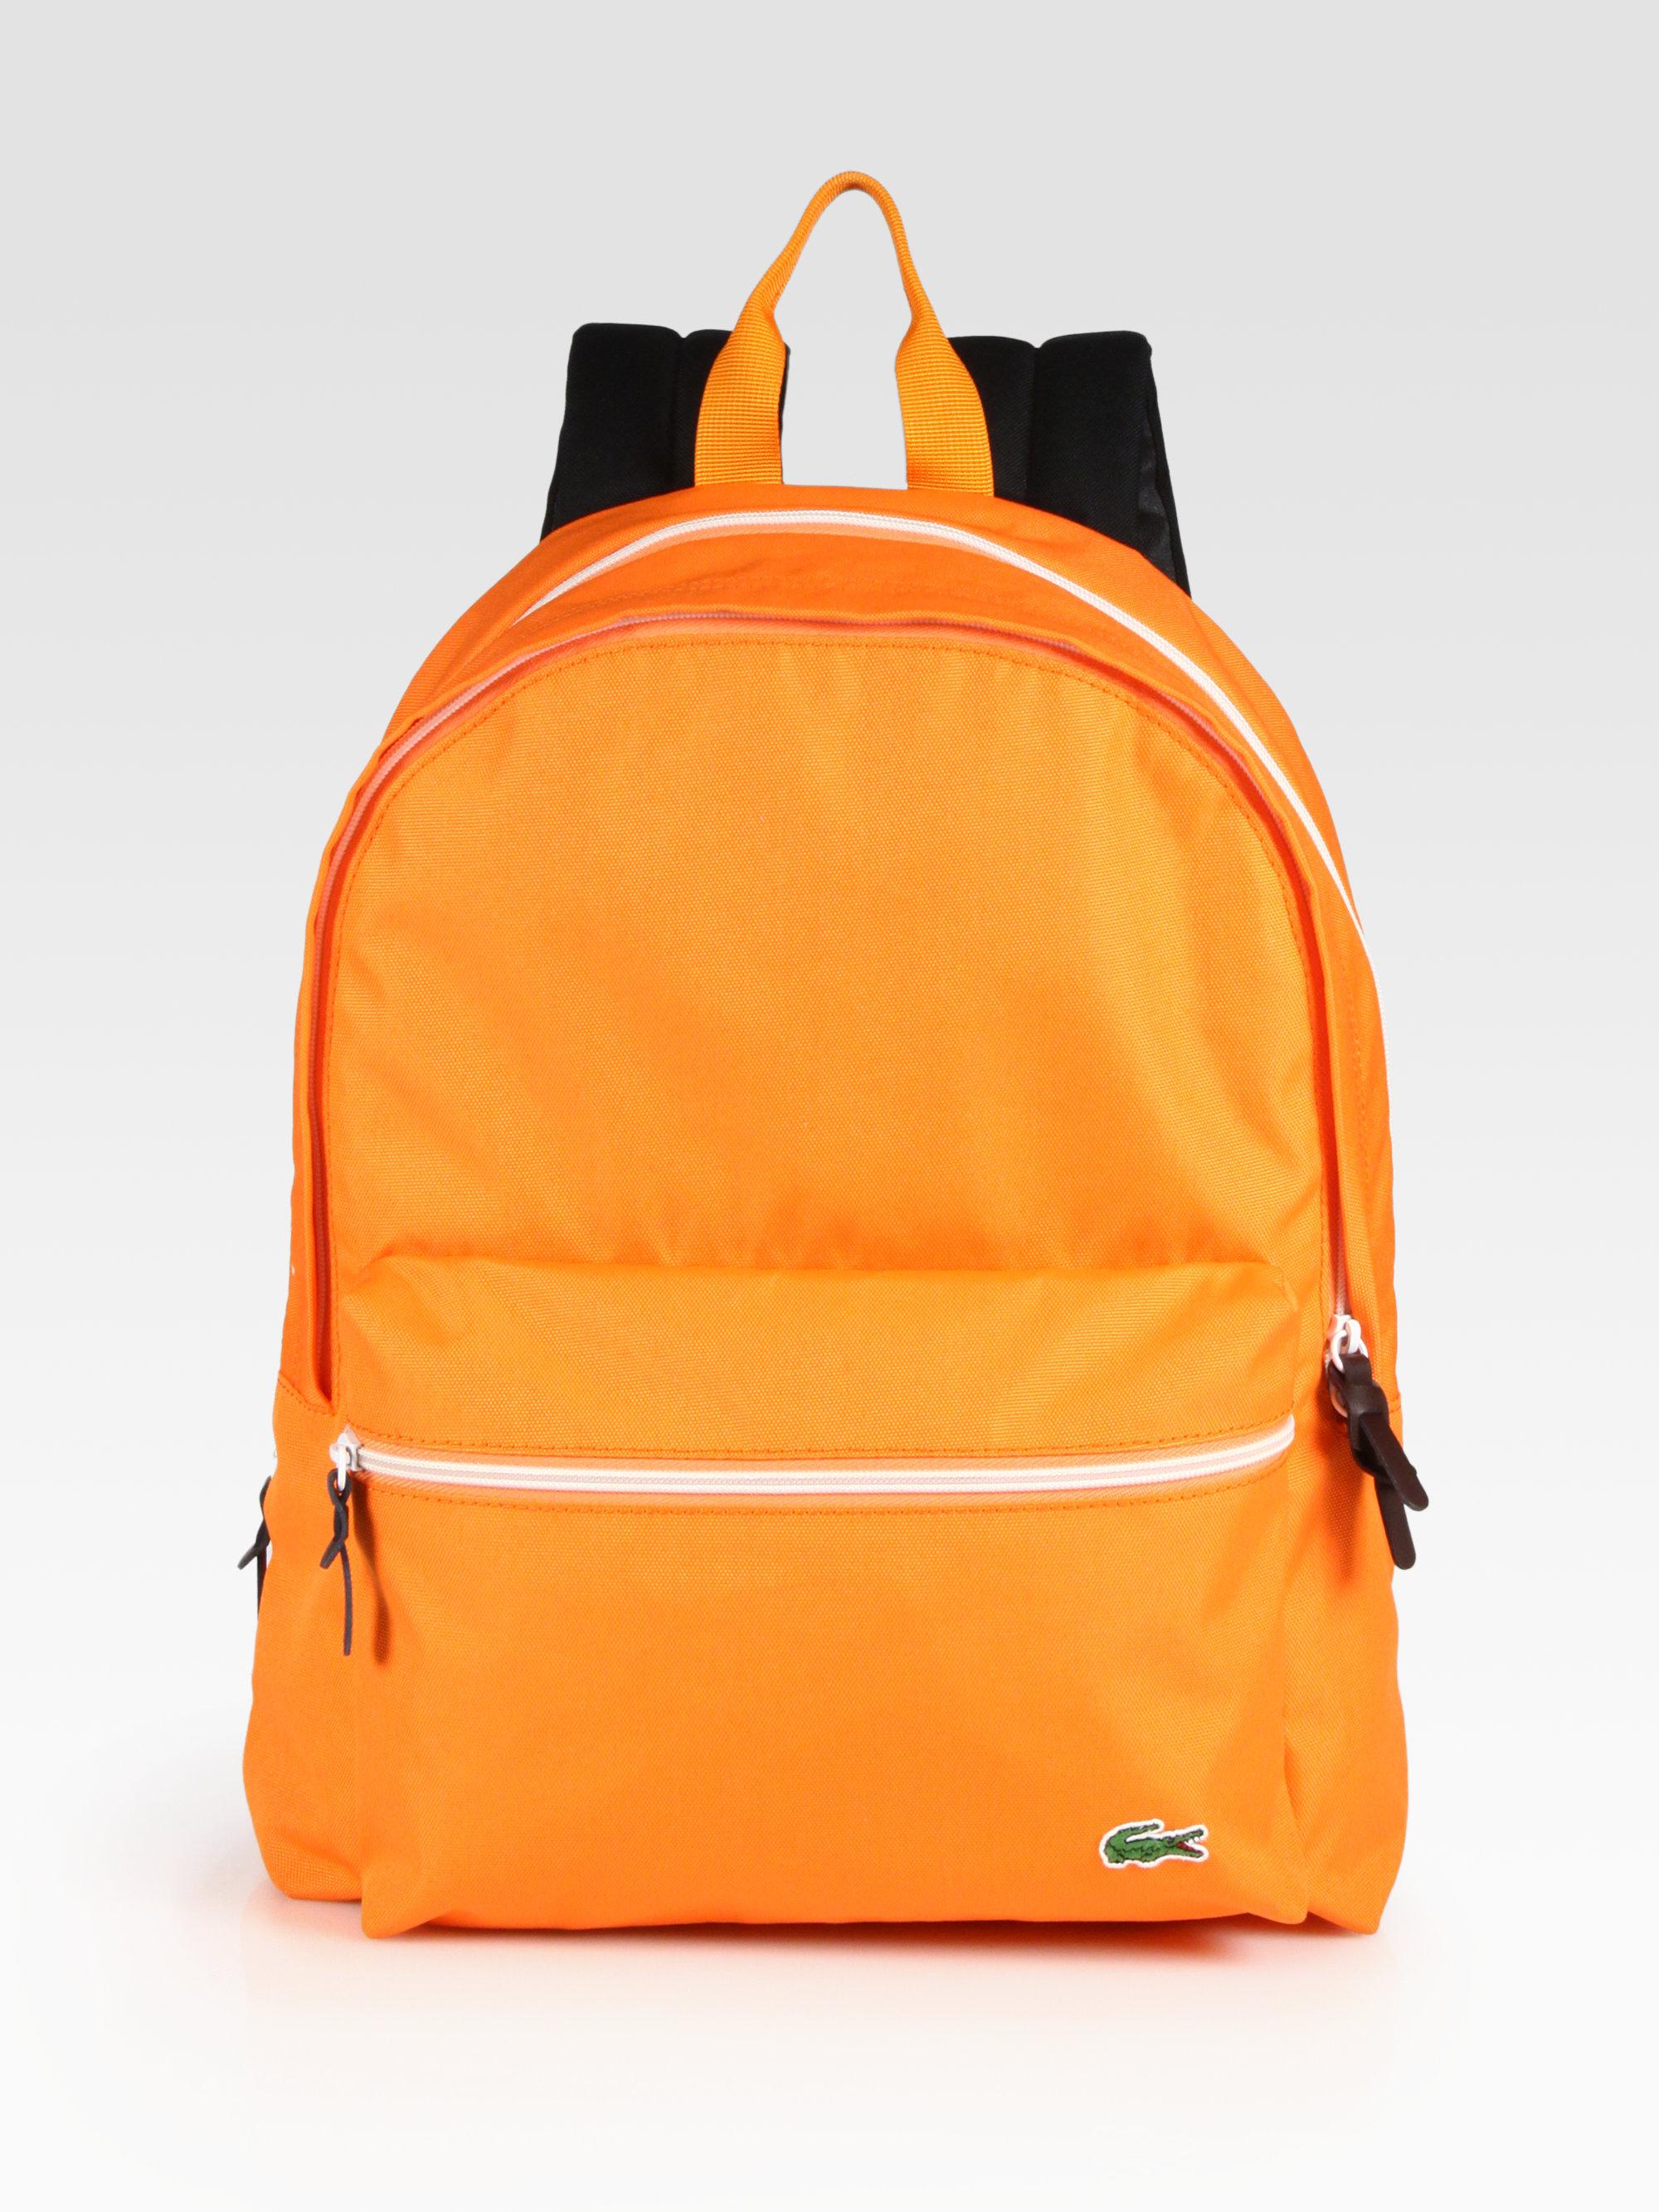 Lyst - Lacoste Backcroc Medium Backpack in Orange for Men